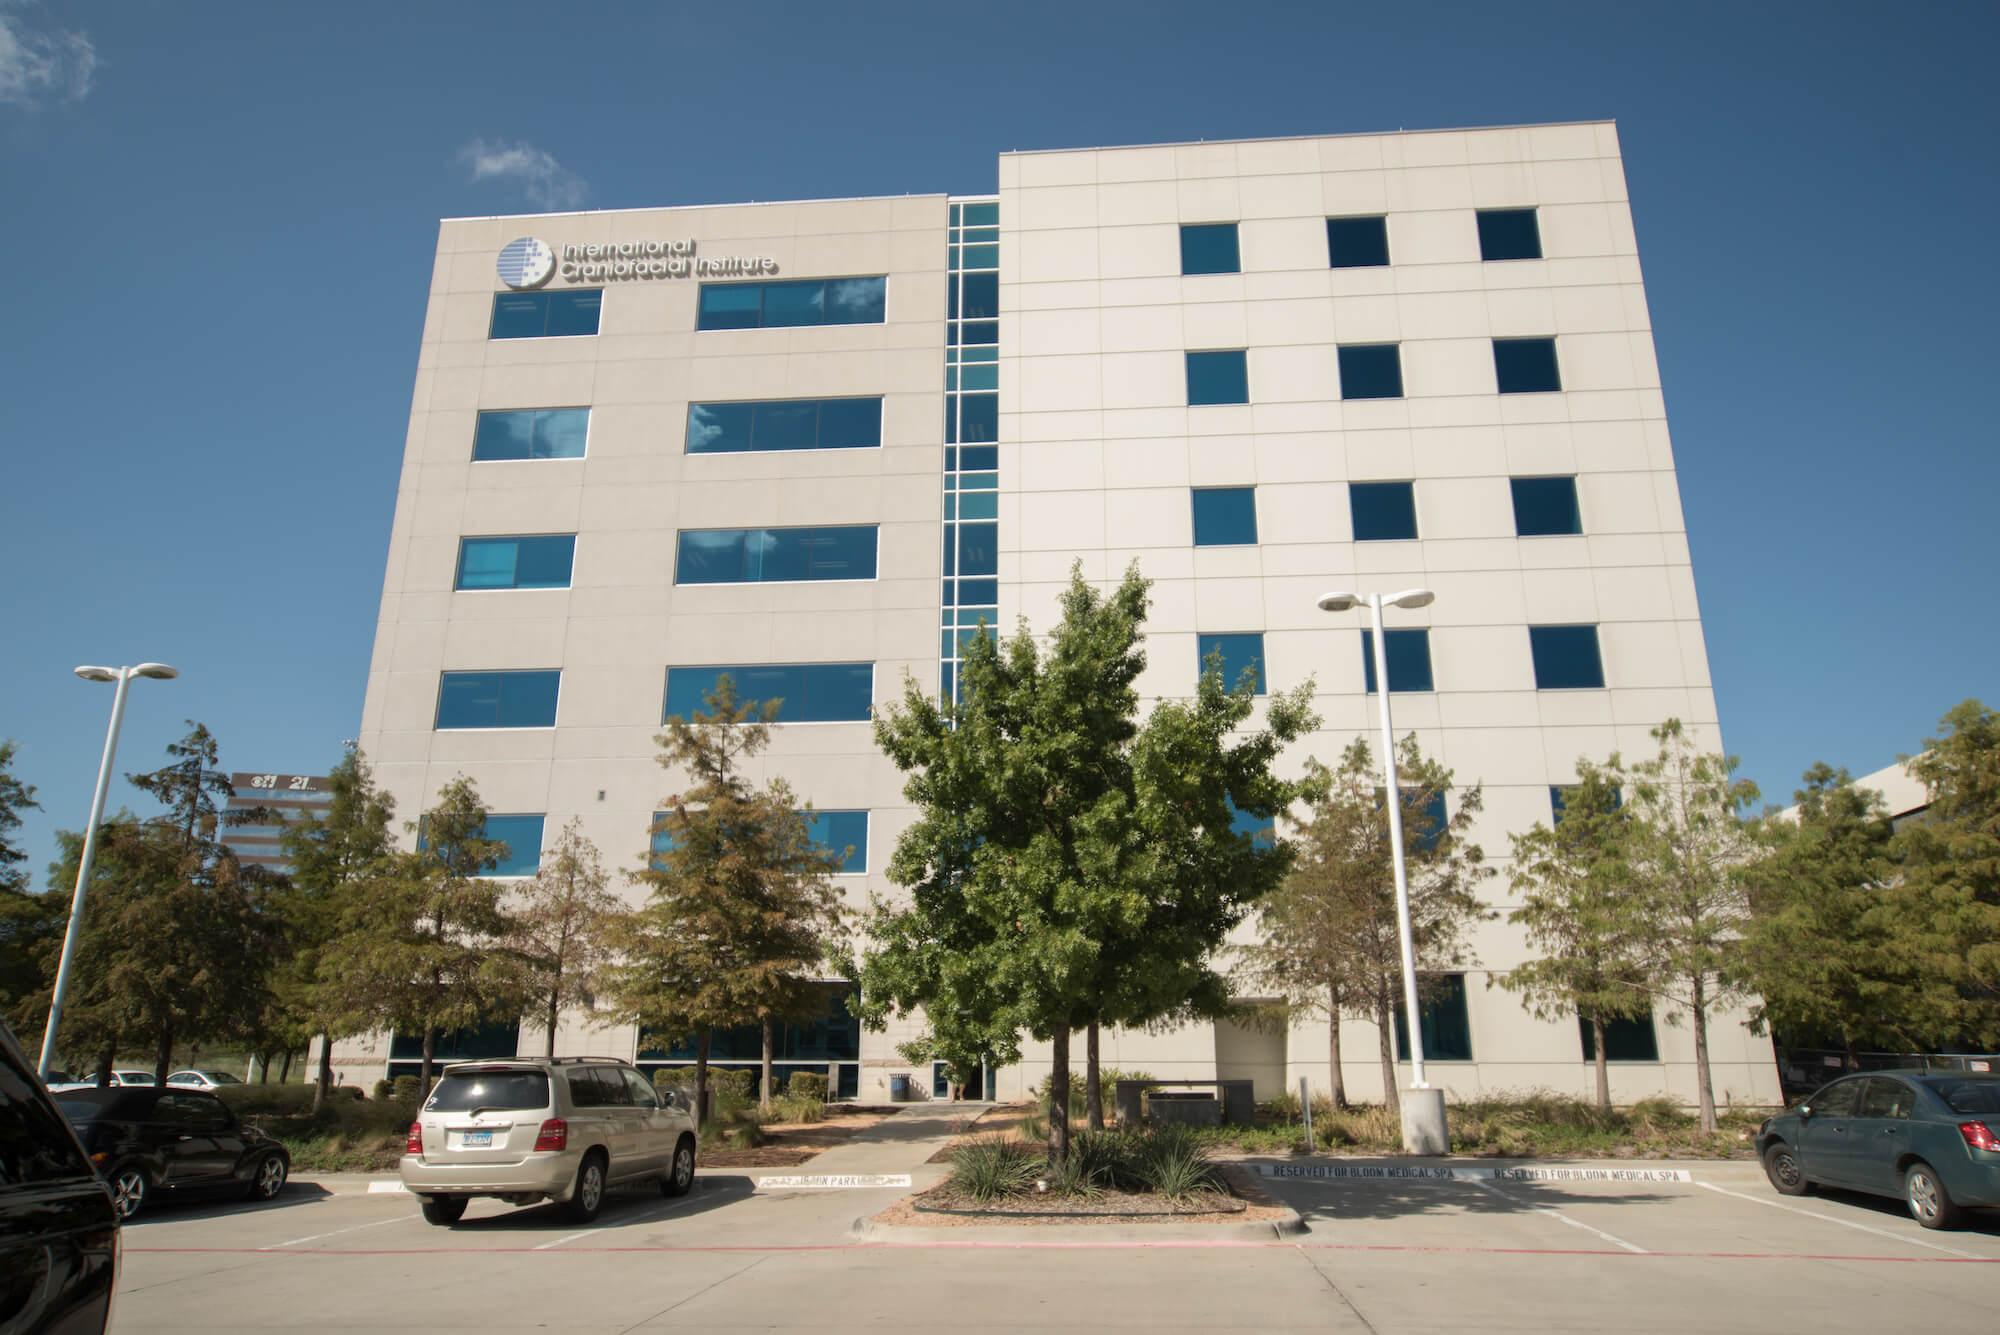 Photo of Forest Park Medical Center